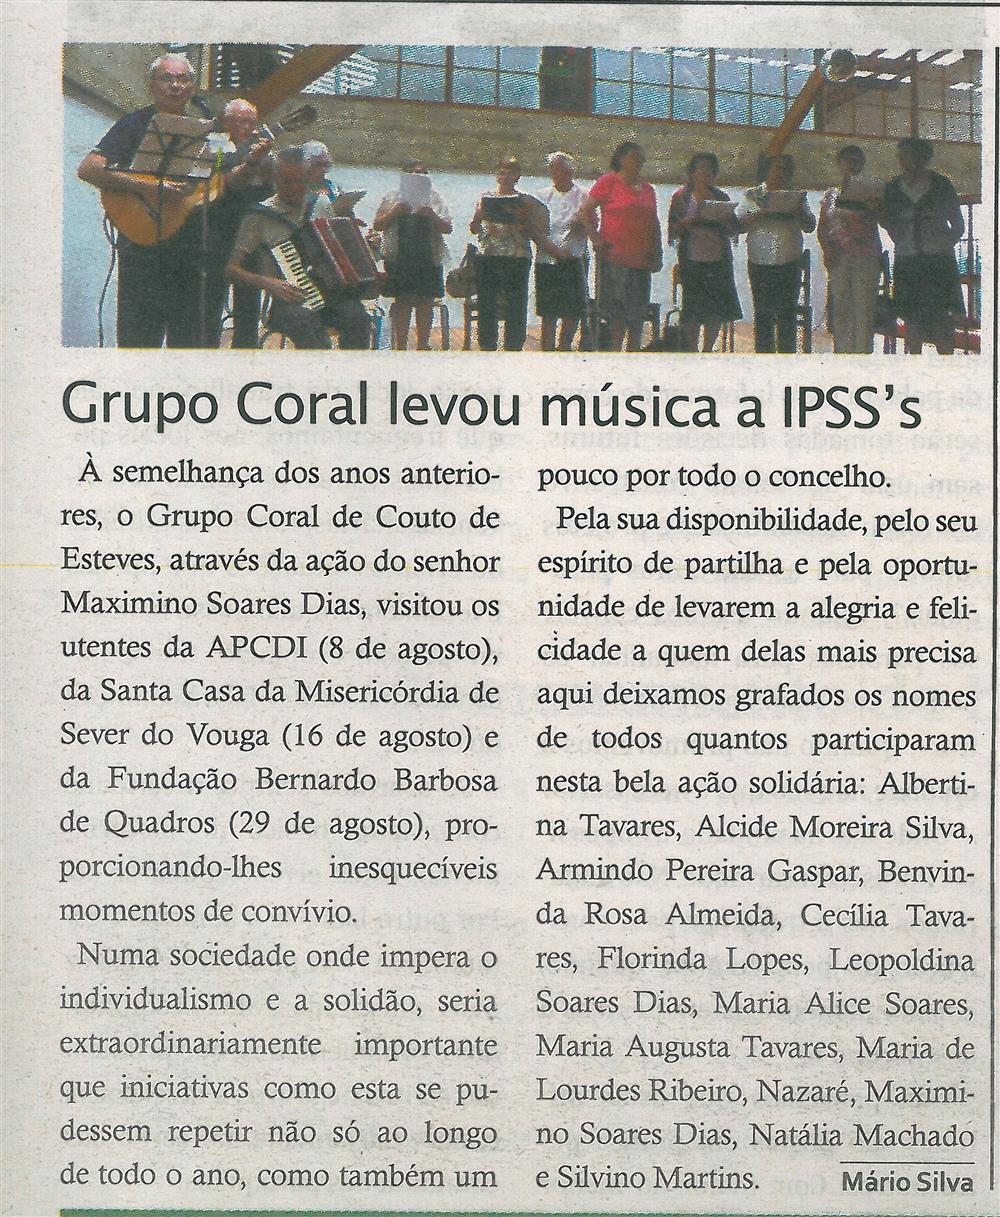 TV-set.'18-p.9-Grupo Coral levou música a IPSS's.jpg